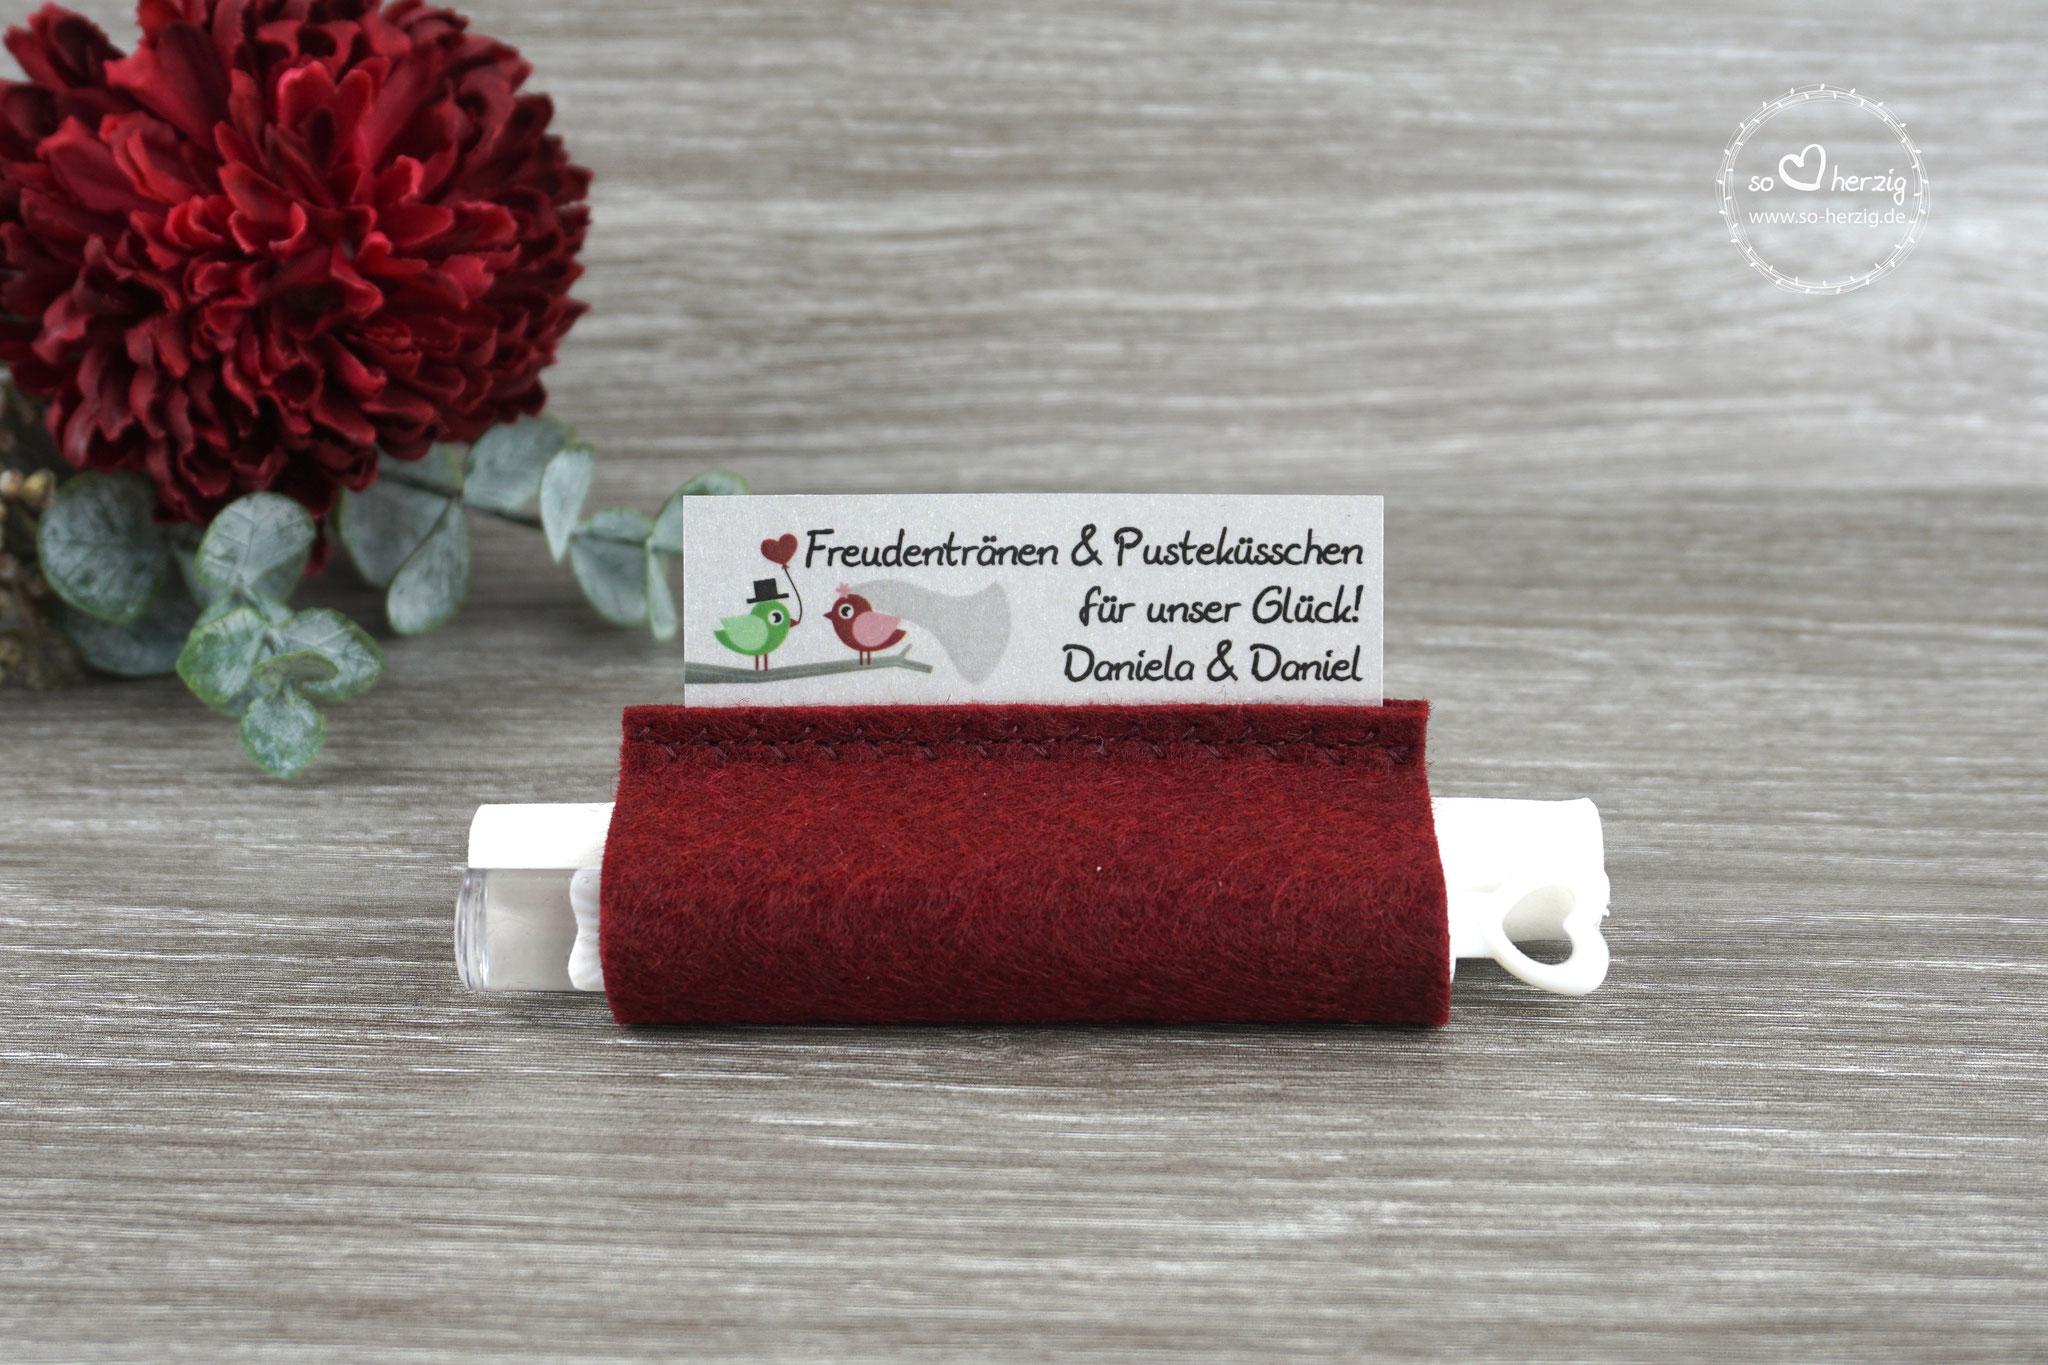 Freudentränen Taschentücher mit Bubbles, Filz Bordeaux, Design Hochzeitsvögel grün/bordeaux